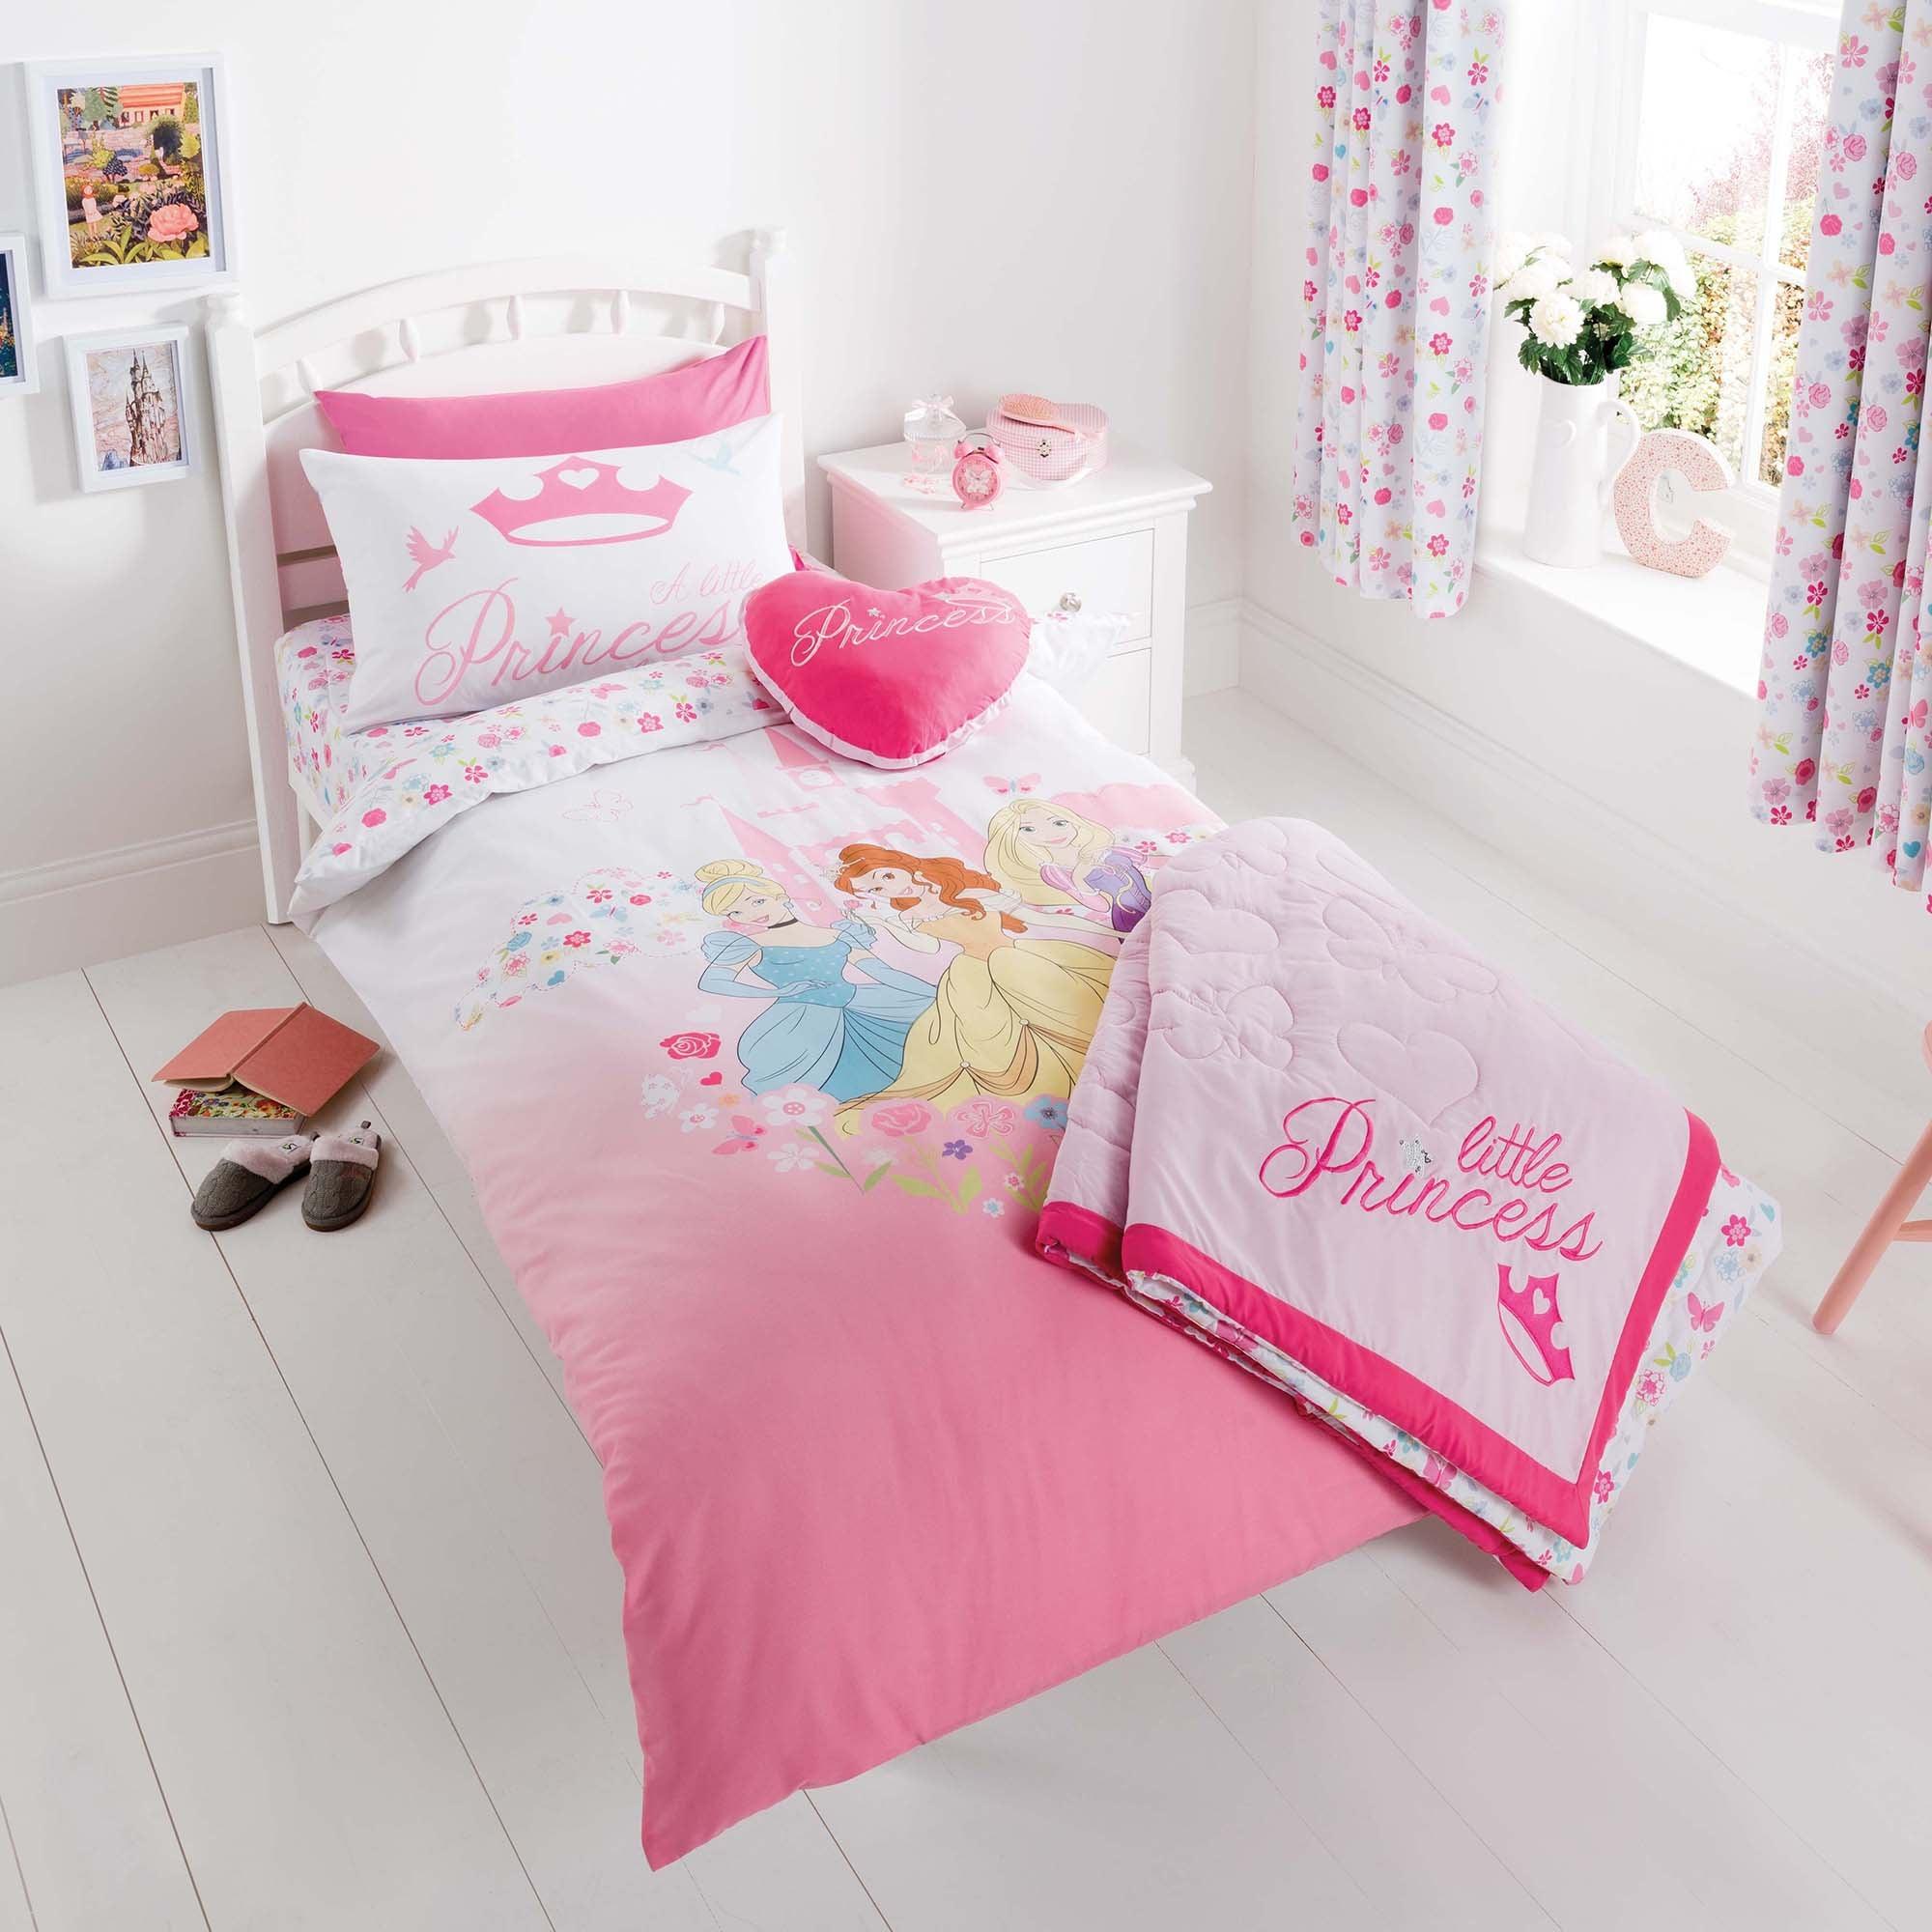 Disney Princess Duvet Cover Set Pink  Blue